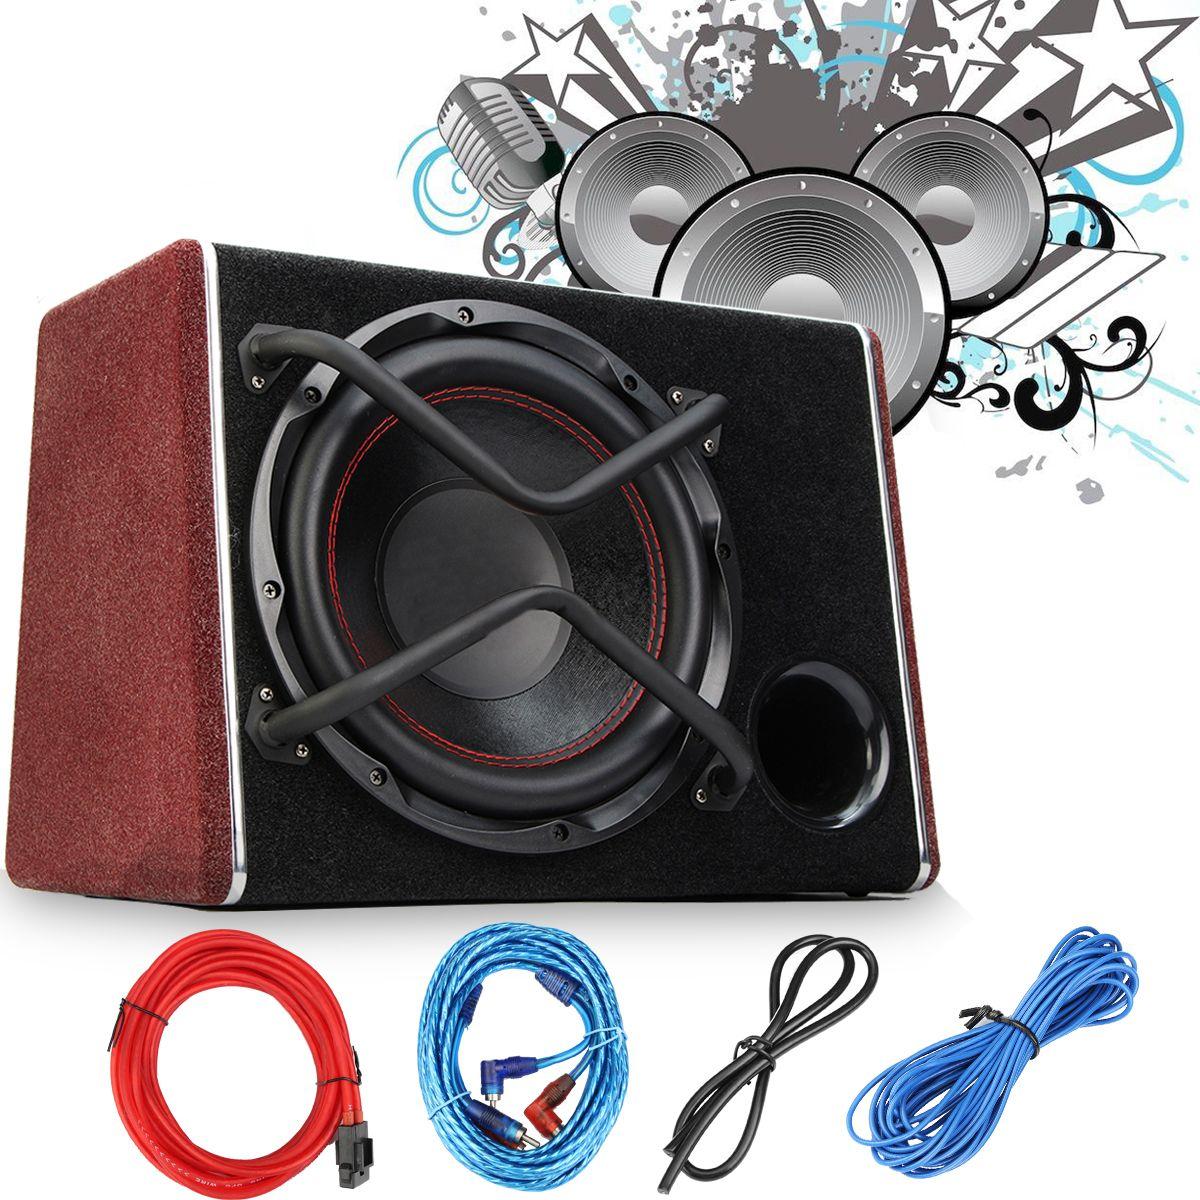 1200 watt Auto Subwoofer Audio Aktive Sub Tieftöner Auto Auto Sub Tieftöner Fahrzeug High Power Verstärker Lautsprecher Super Bass